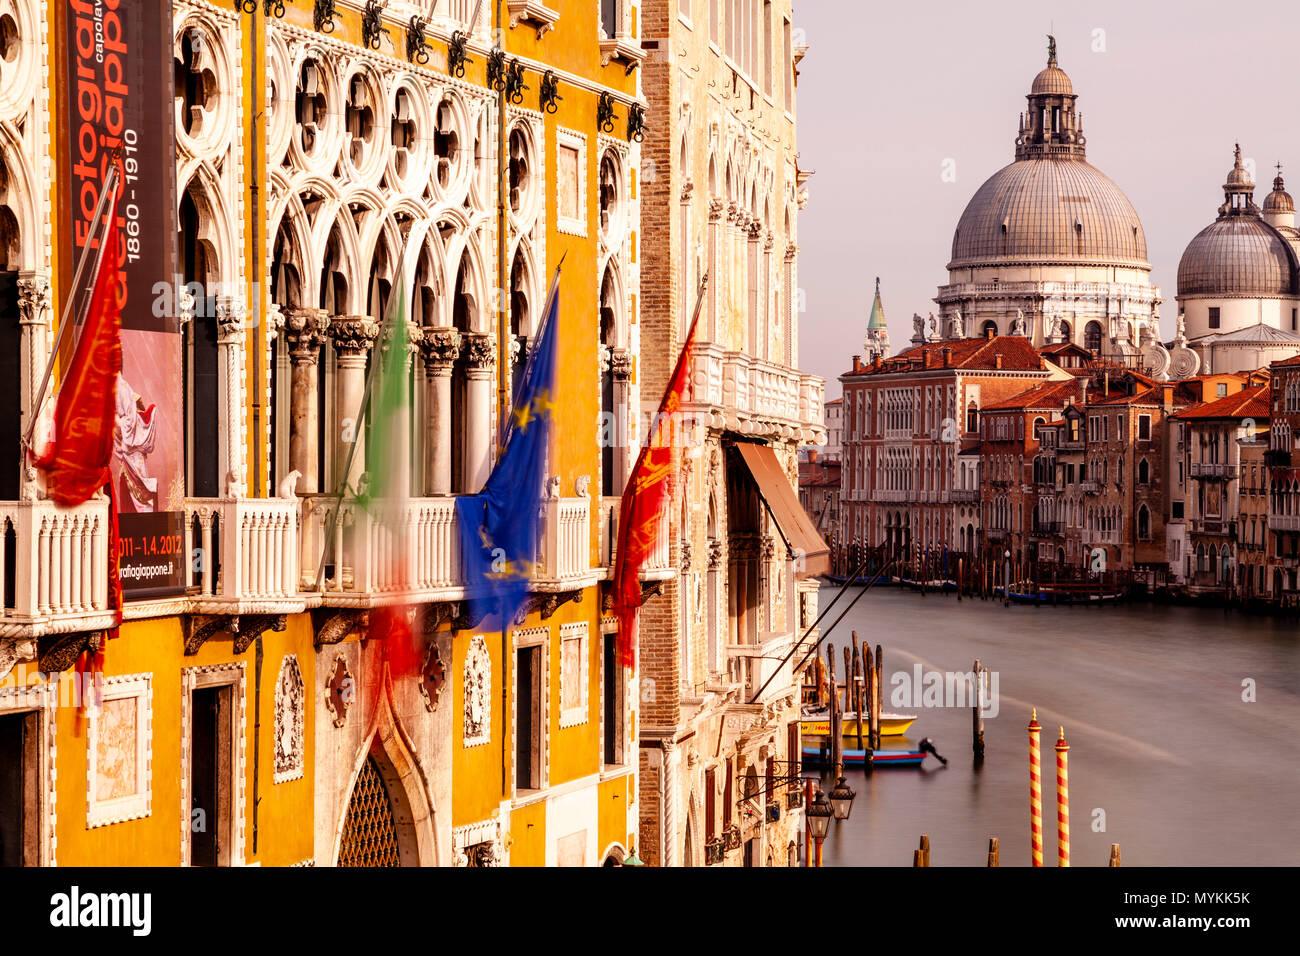 The View Down The Grand Canal Towards Santa Maria Della Salute Church From The Accademia Bridge, Venice, Italy Stock Photo